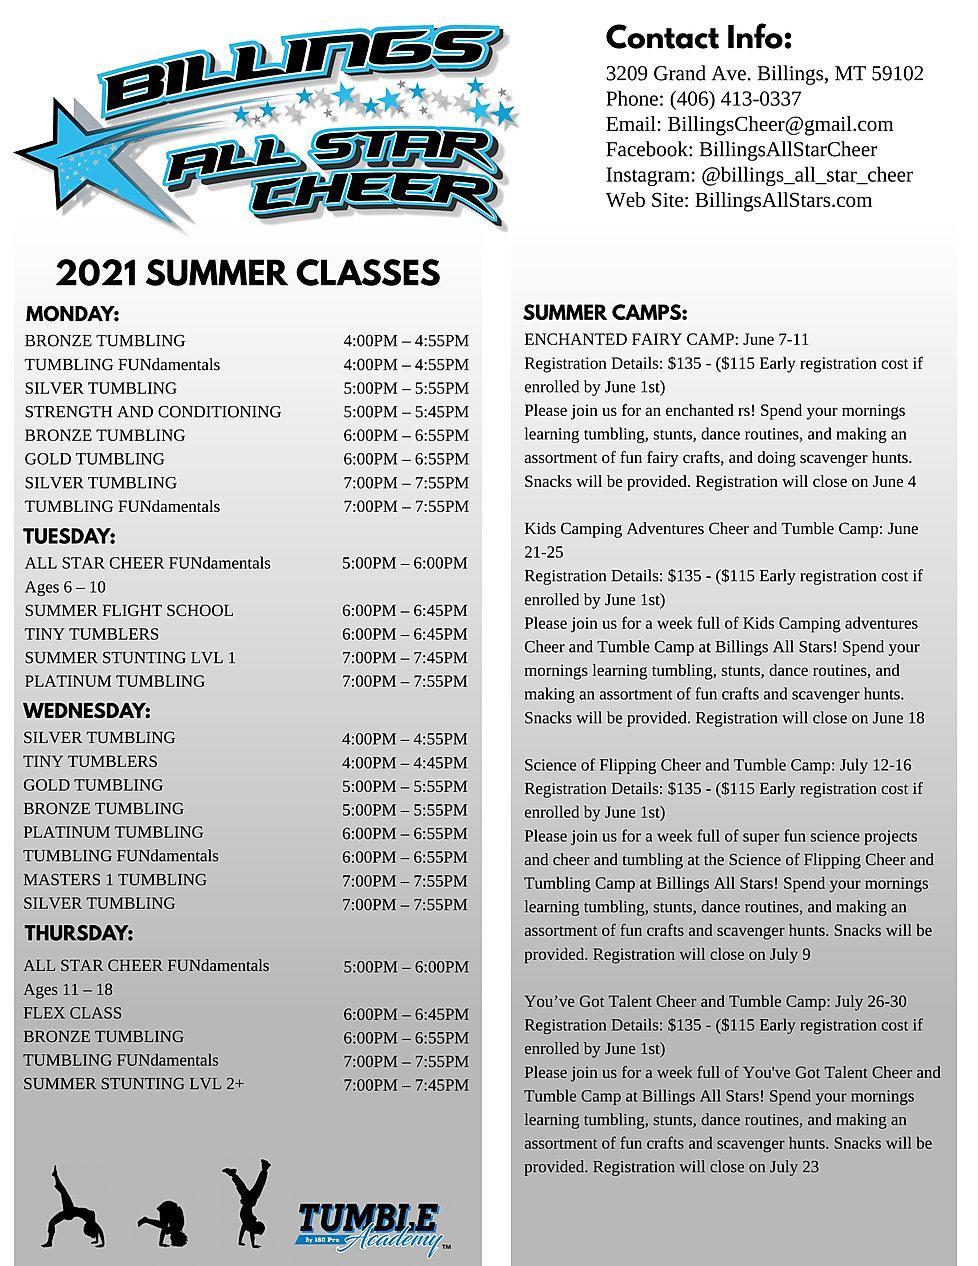 2021 Summer Classes.jpg